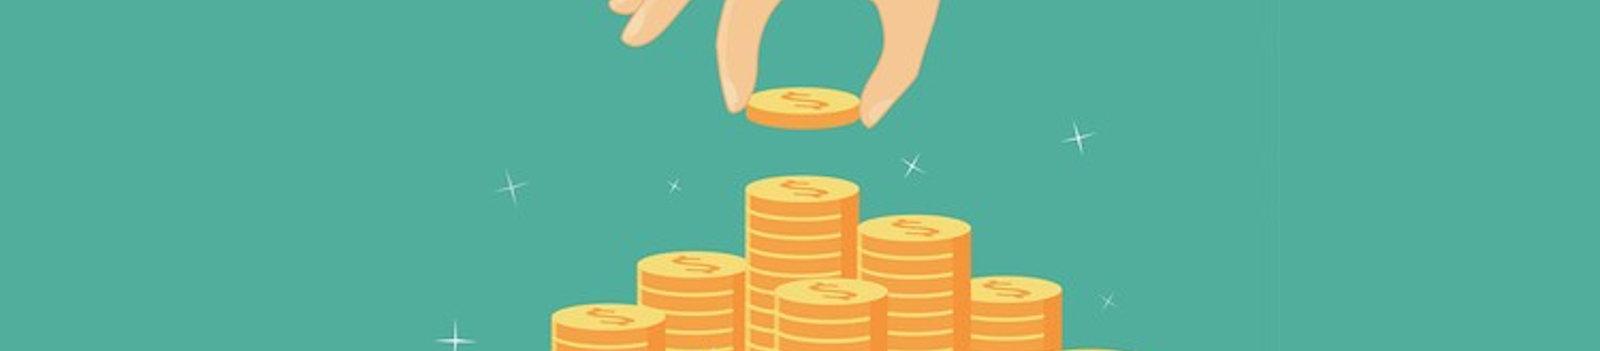 RE:work Richmond financial mentoring